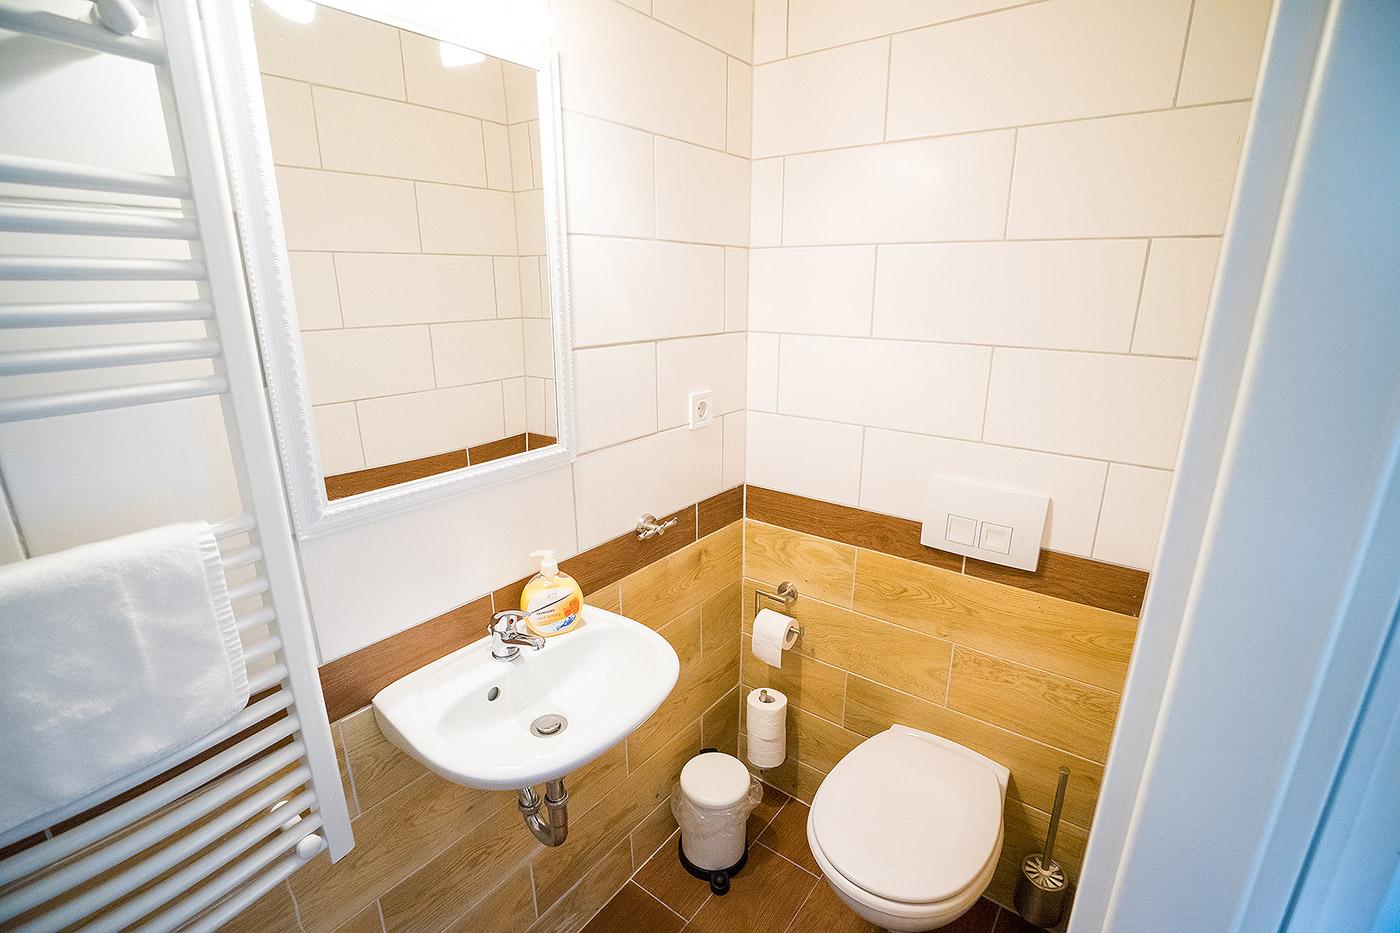 Toilette im Hotel